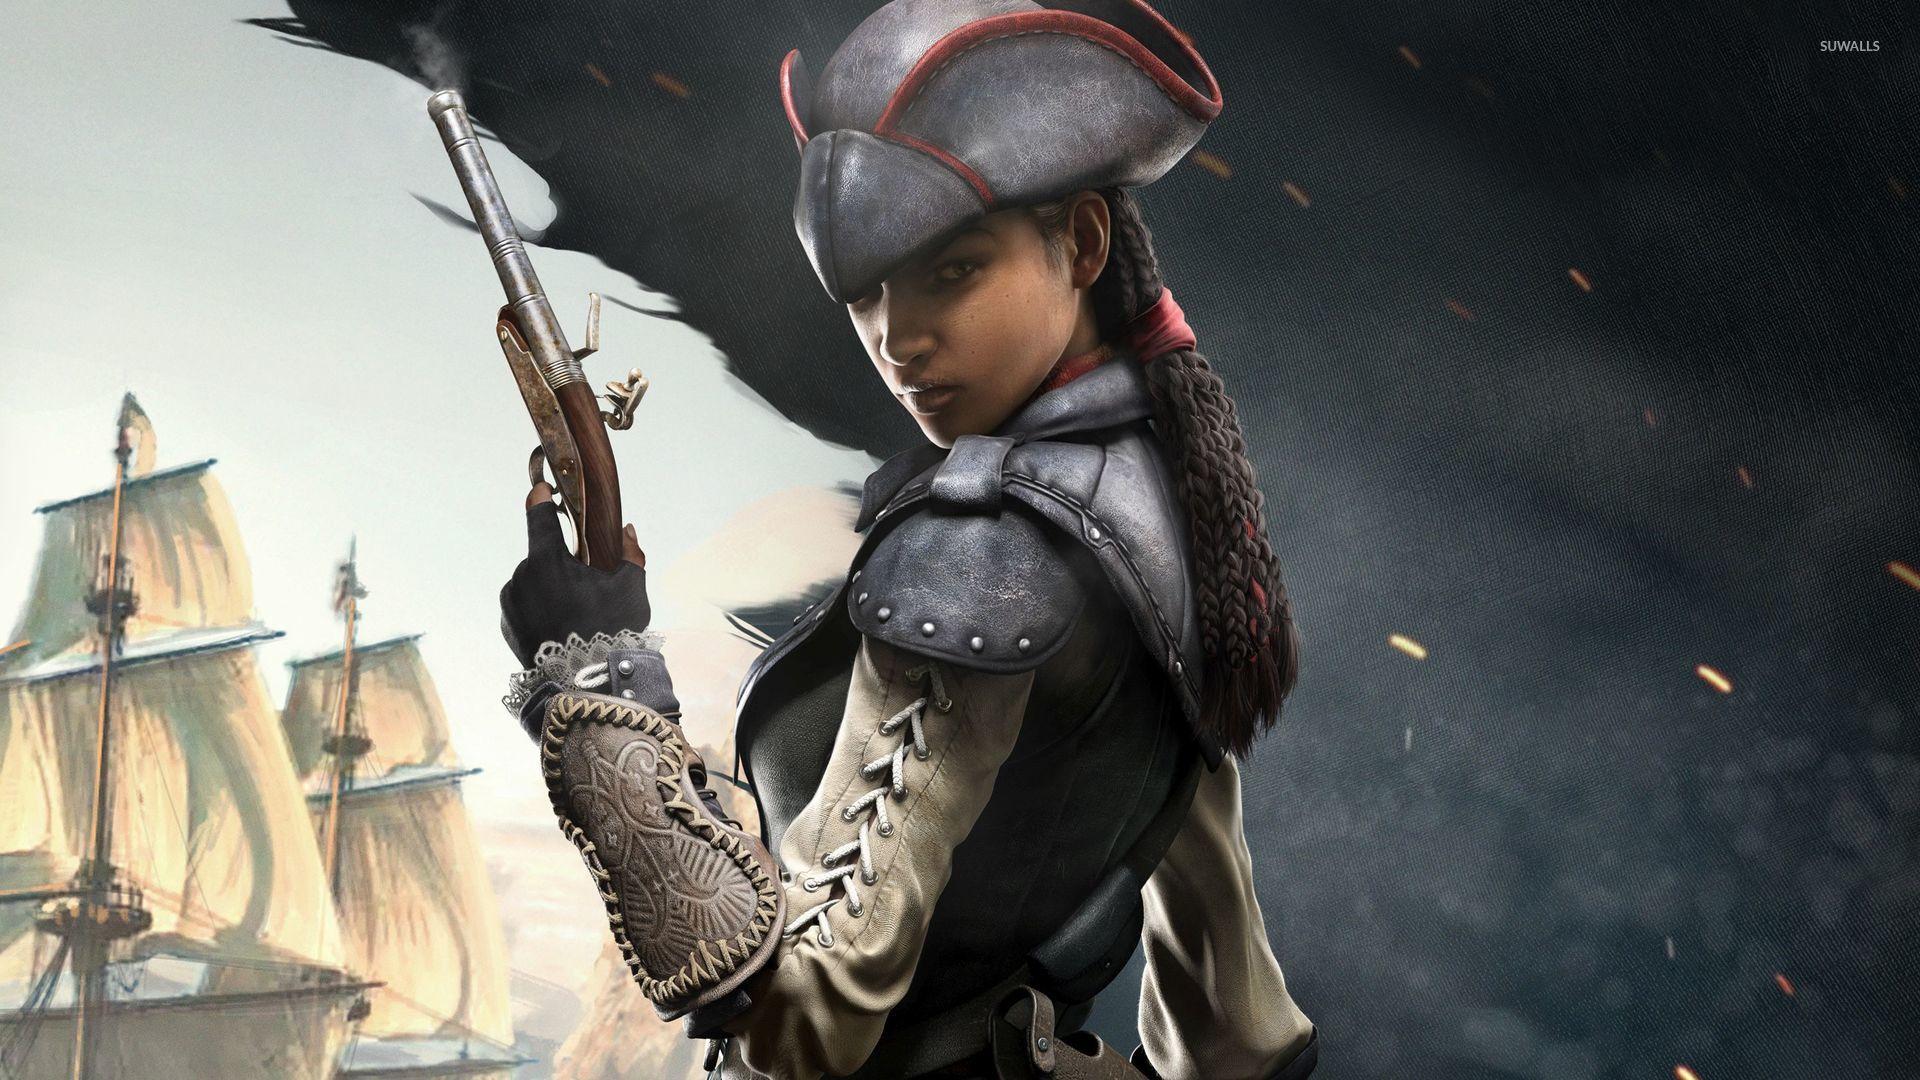 Assassin's Creed IV: Black Flag [23] Wallpaper